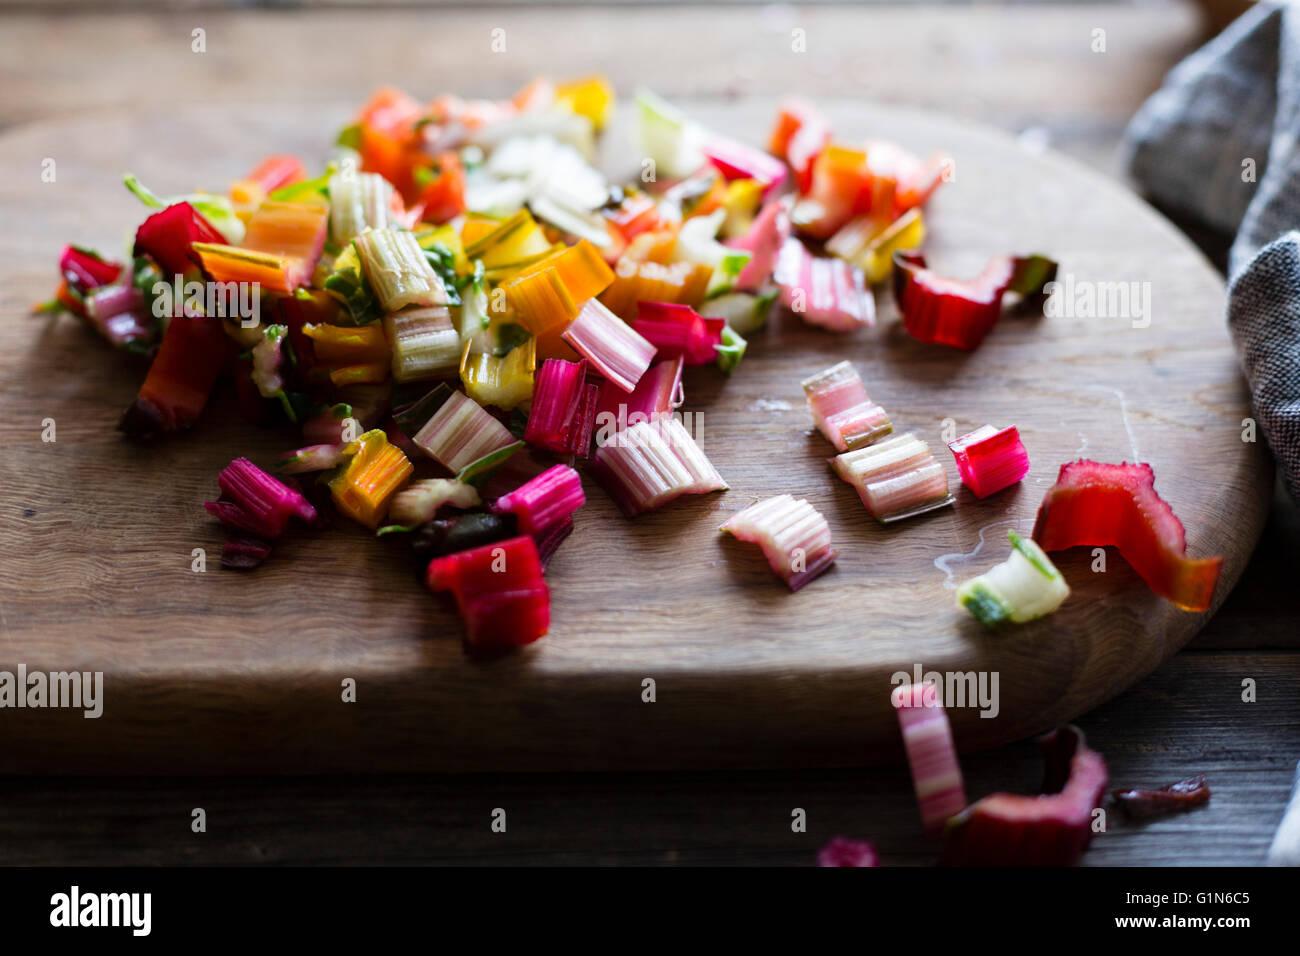 Chard vegetable stems Stock Photo